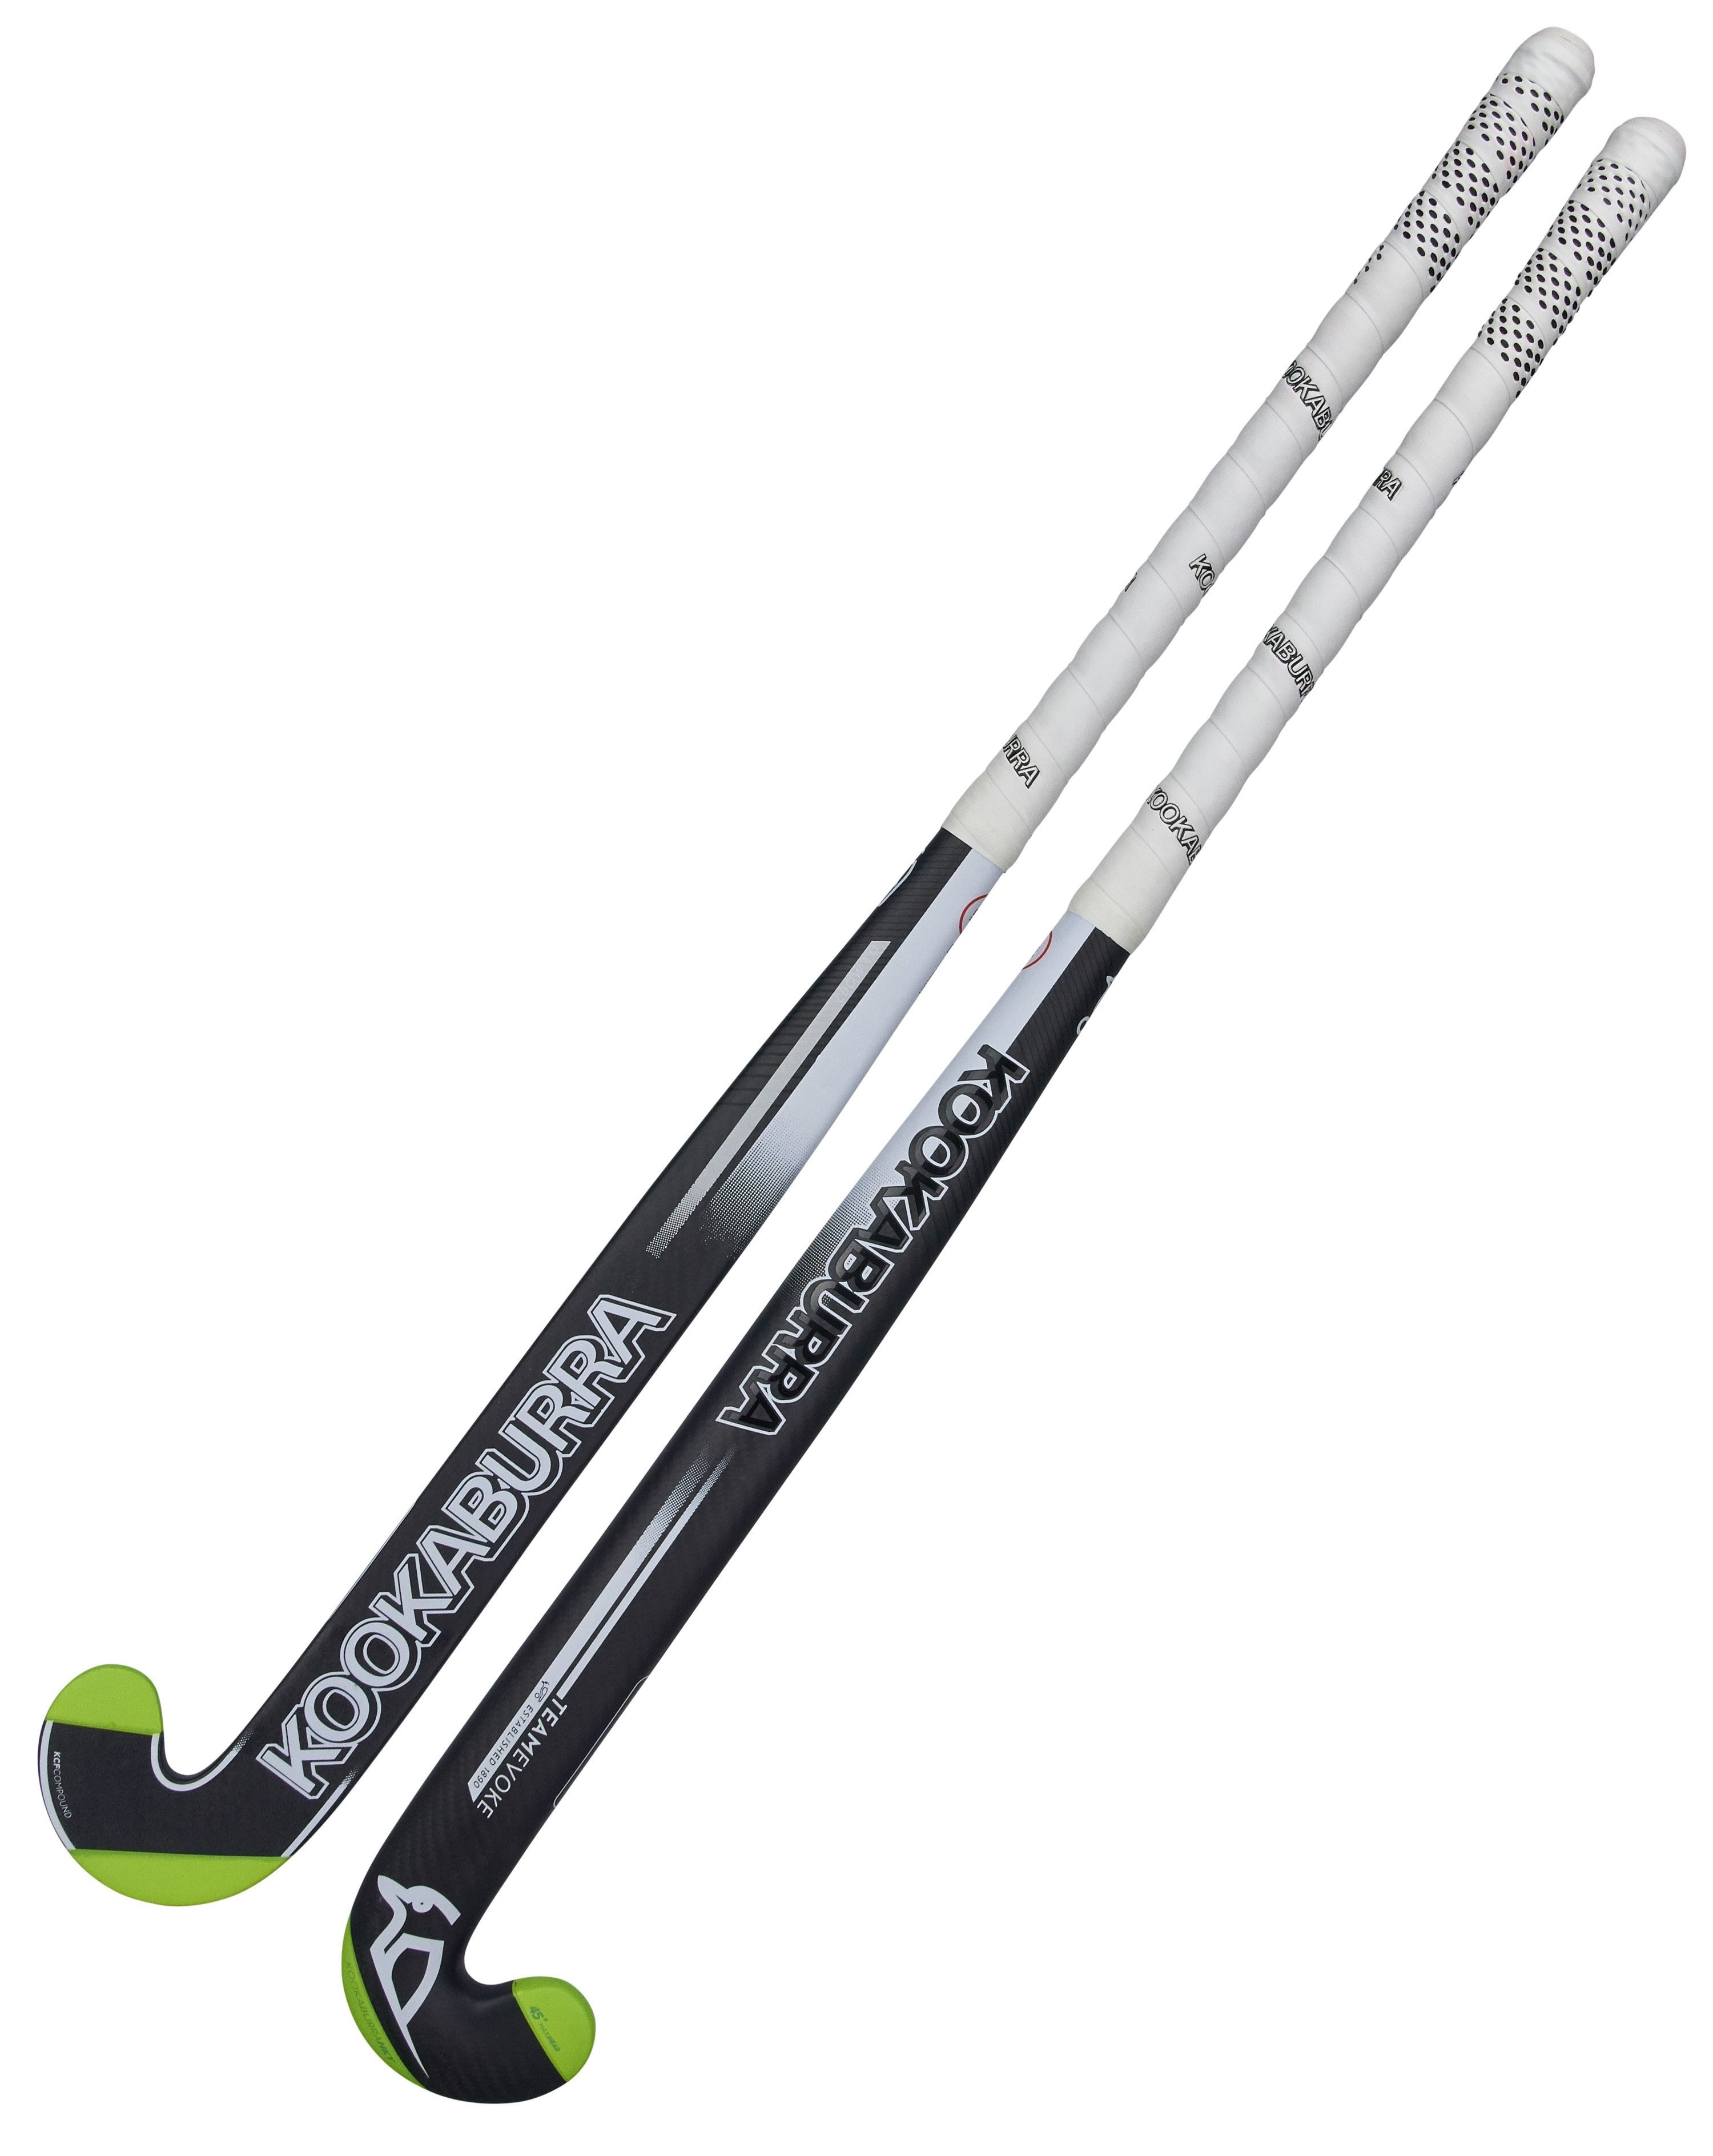 2017/18 Kookaburra Team Evoke - Lbow 1.0 Hockey Stick